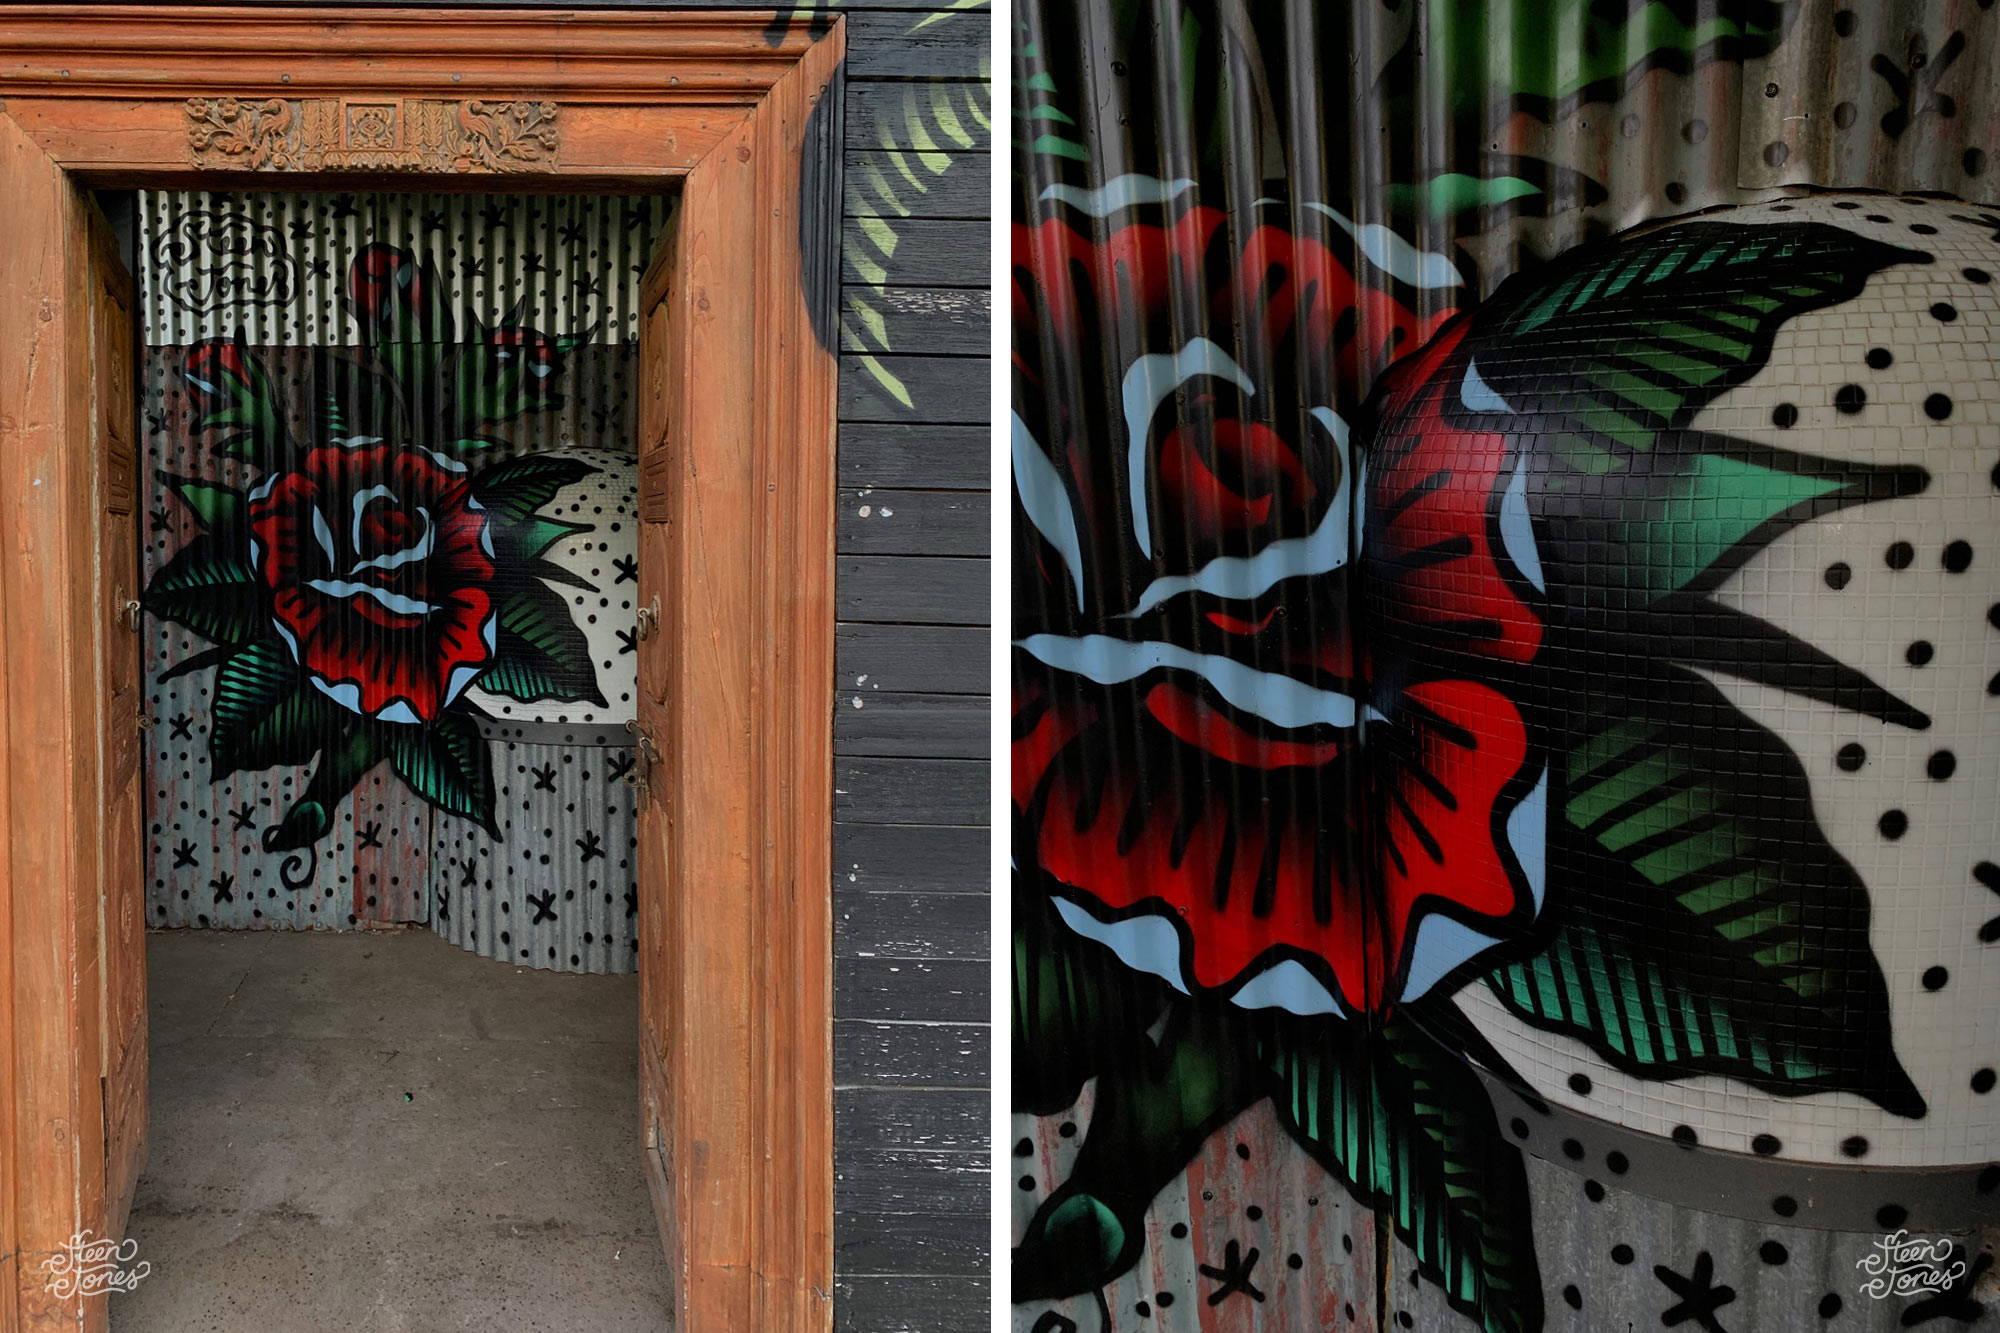 Steen Jones tattoo street graffiti Australia Captain Capel Melbourne VIC mural